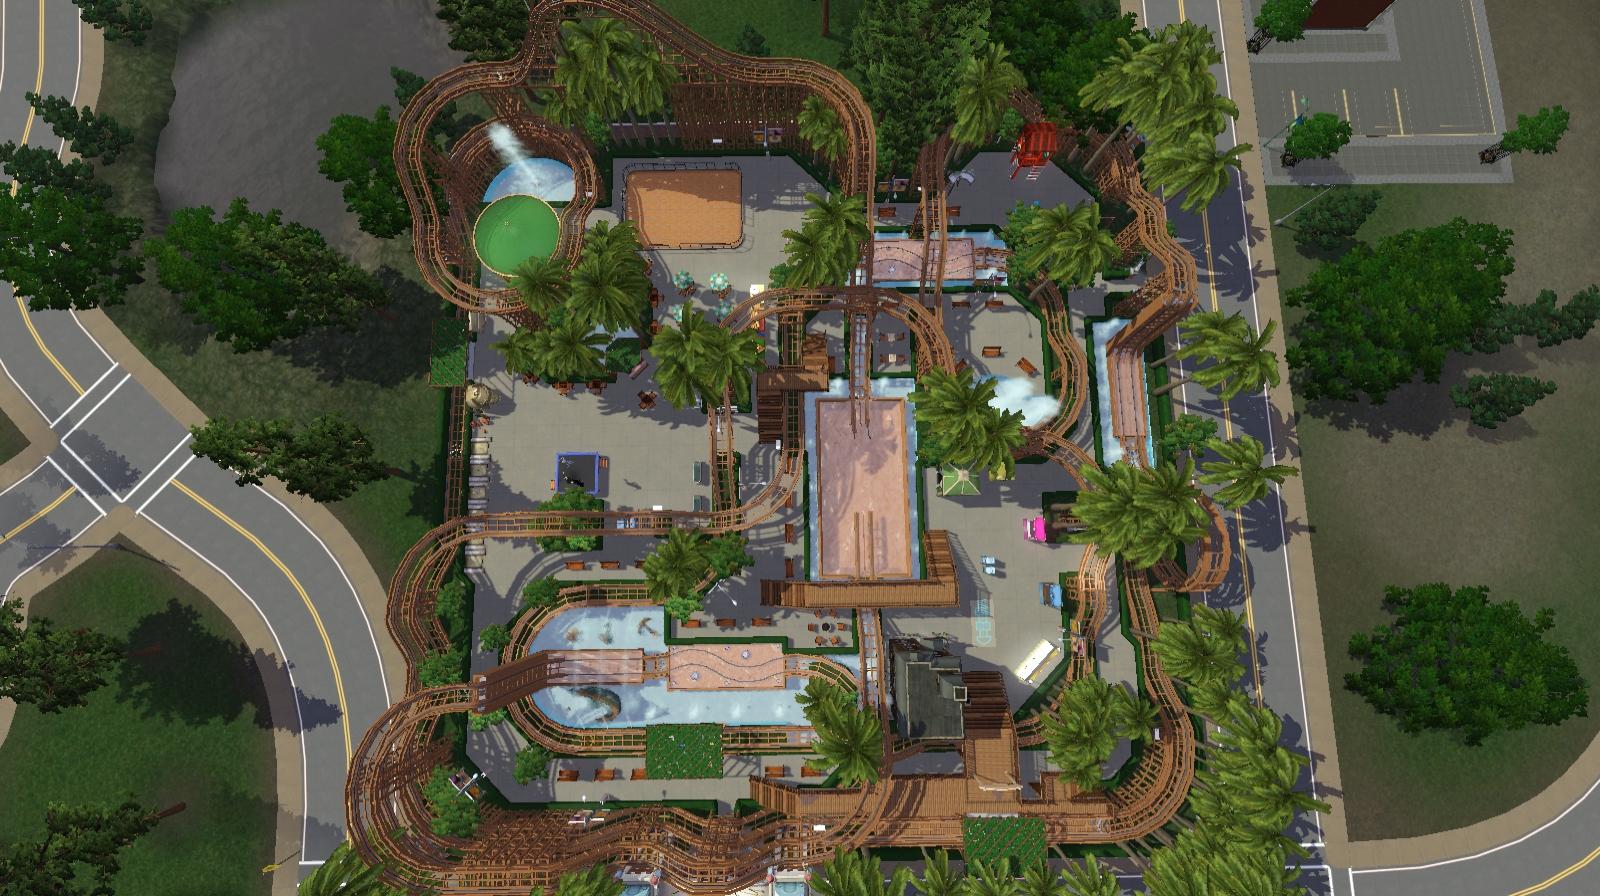 [Descarga] Parque Adventure Park. Screenshot-48